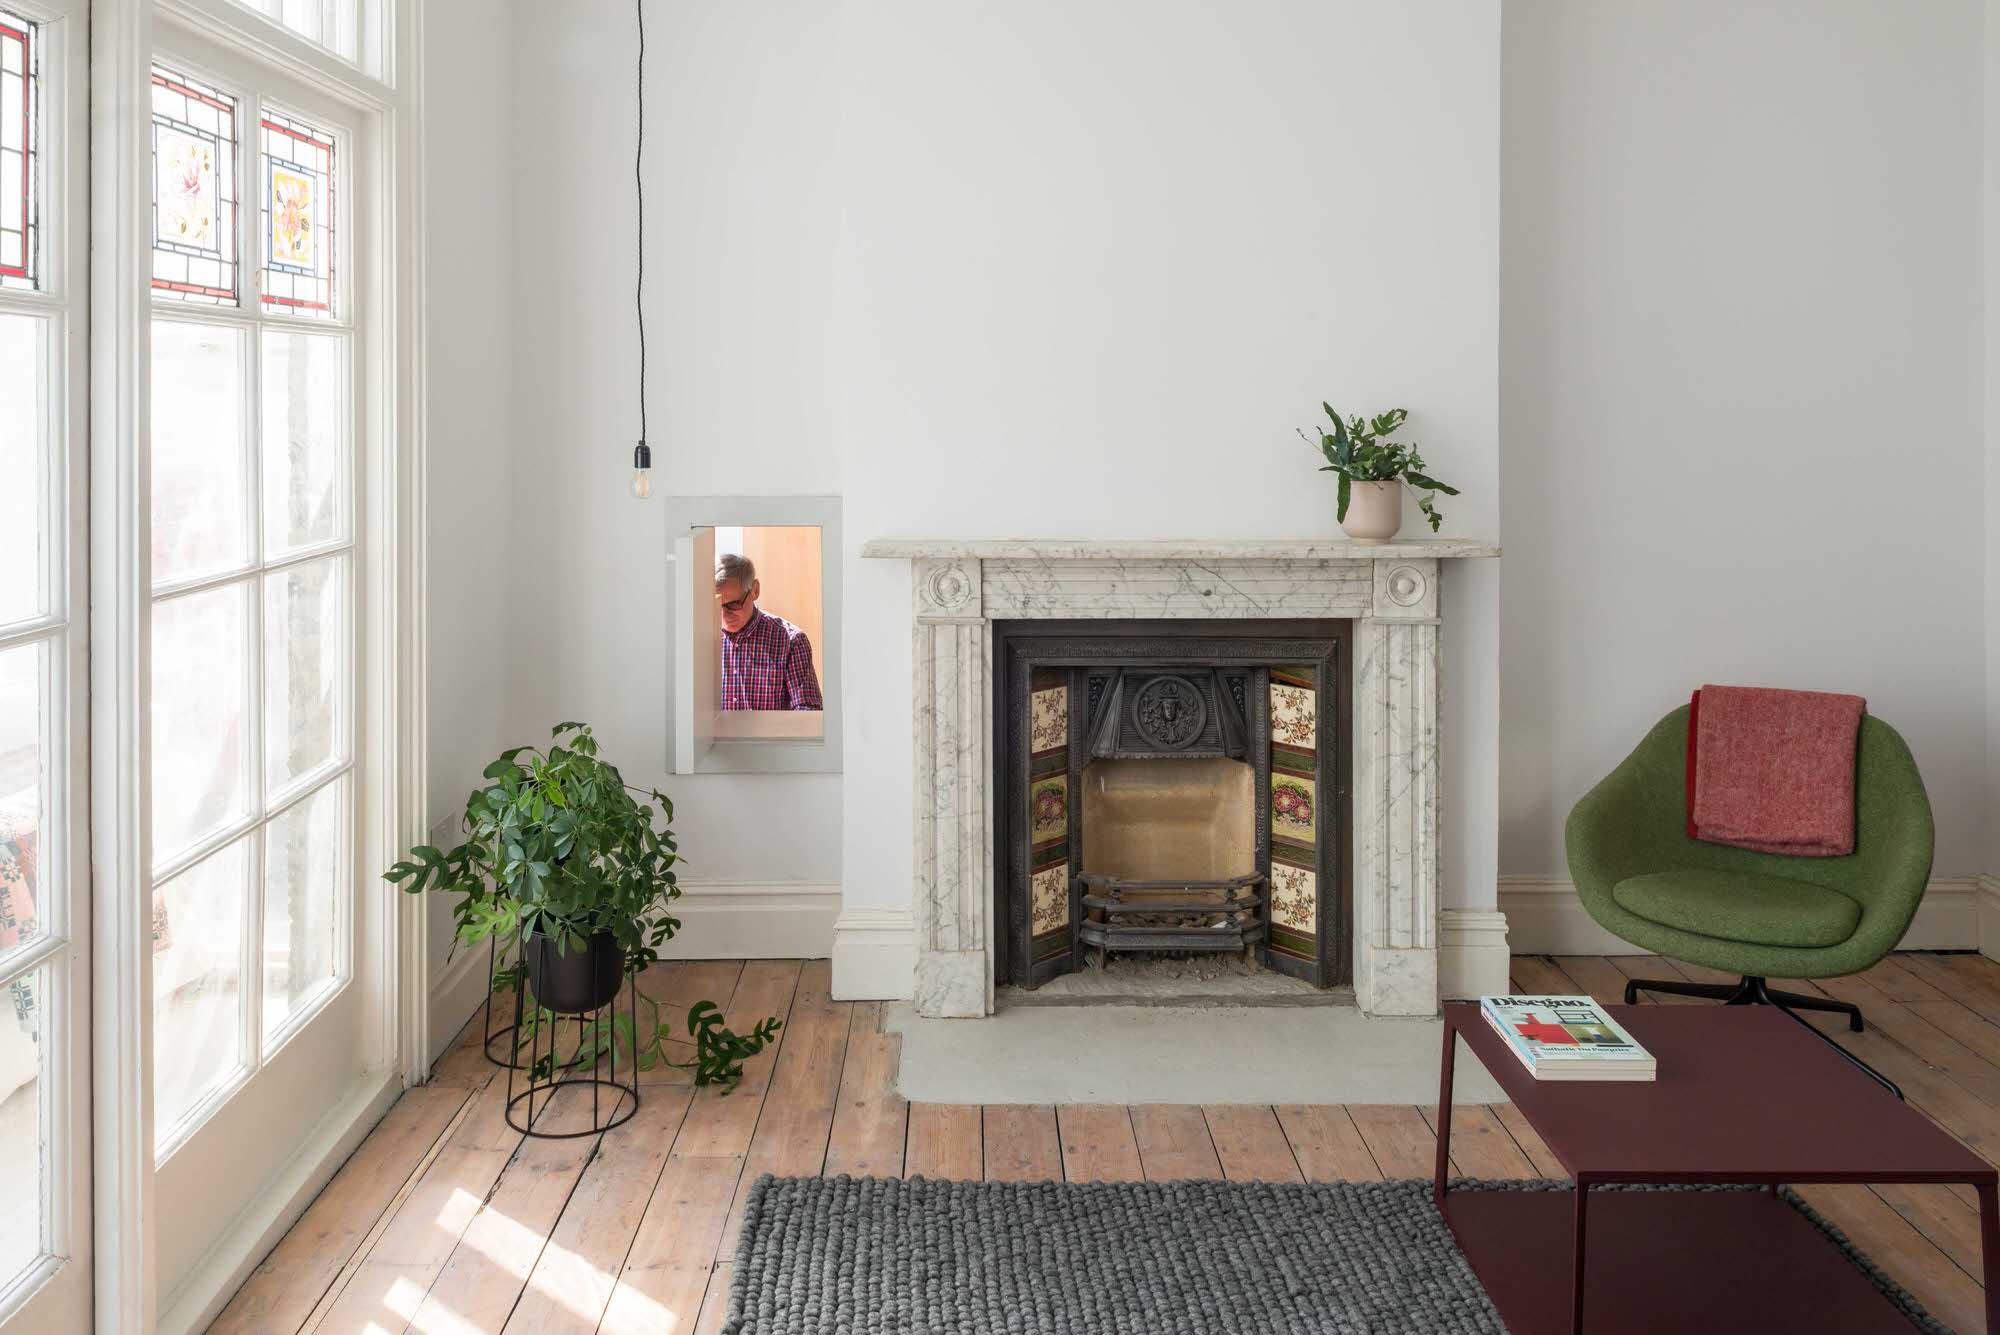 Studio Ben Allen House Recast London Residential Architecture Photo French+tye Yellowtrace 22